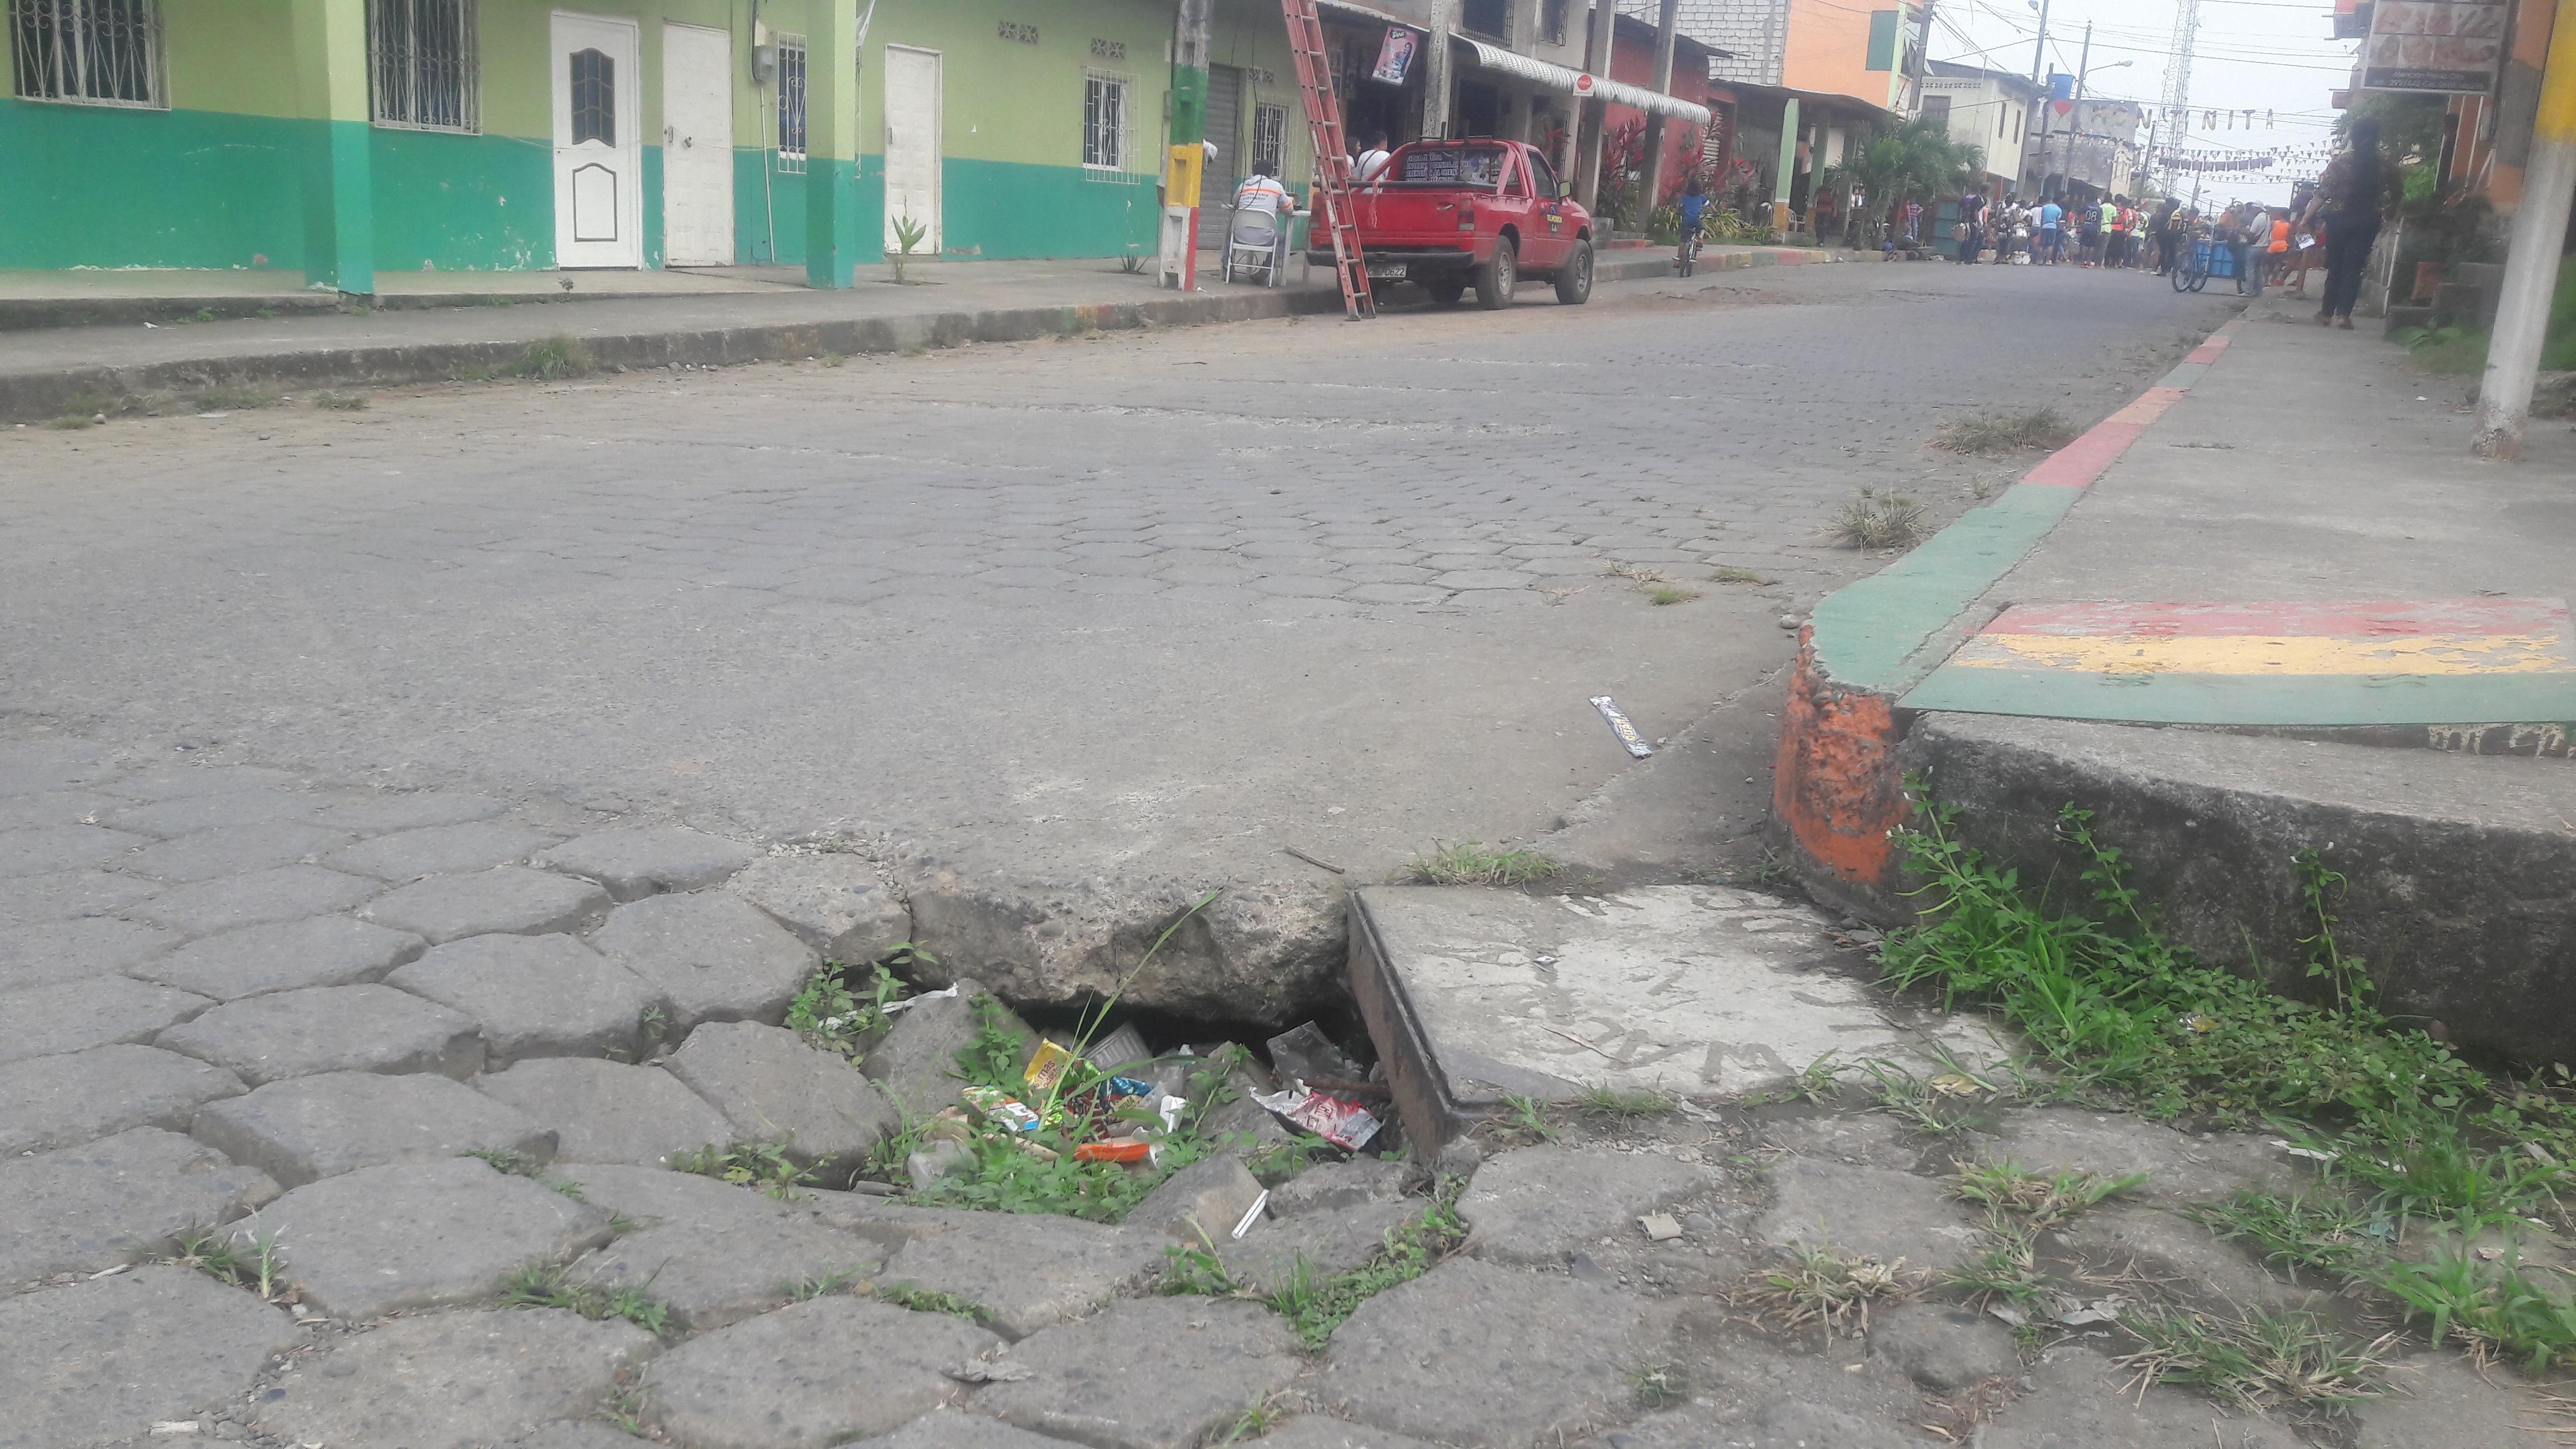 Adoquines se hunden en la calle